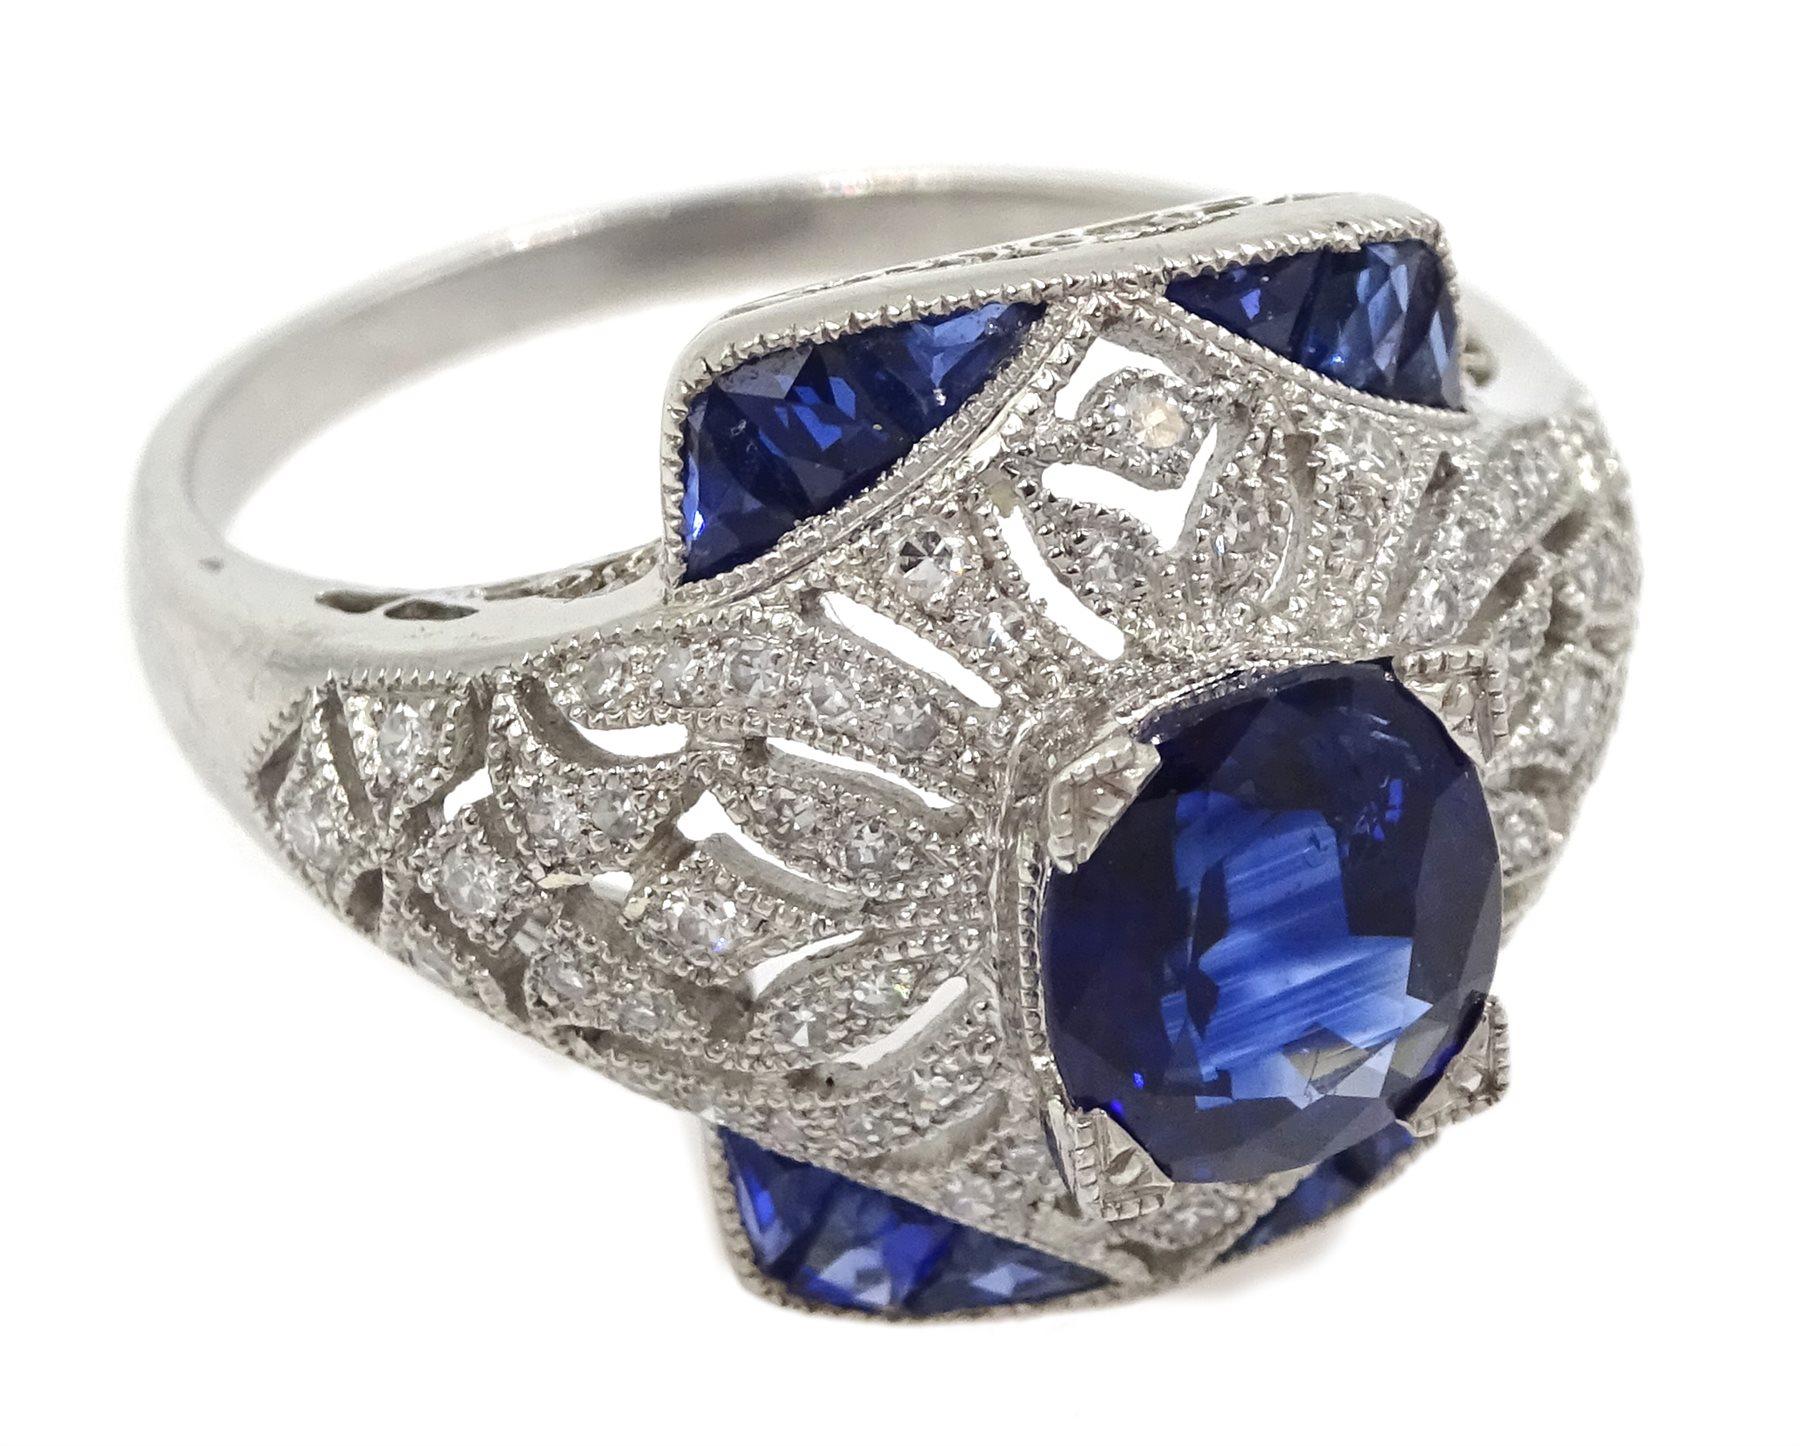 Platinum sapphire and diamond dress ring, pierced openwork setting, free UK mainland shipping - Image 3 of 6